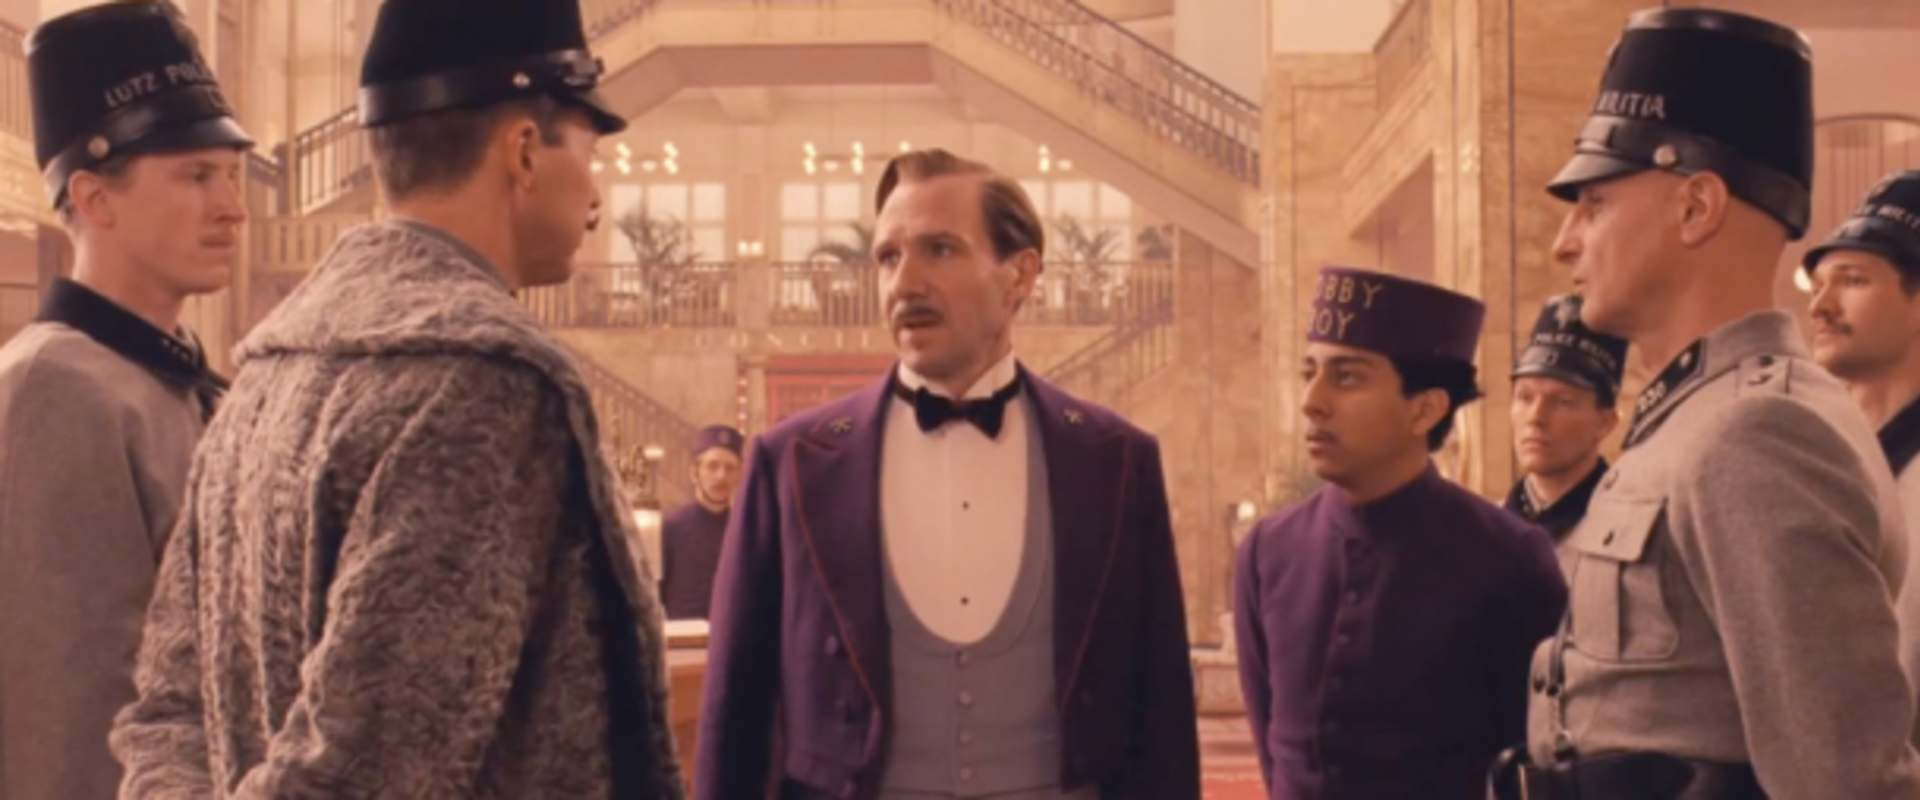 Watch The Grand Budapest Hotel On Netflix Today Netflixmovies Com